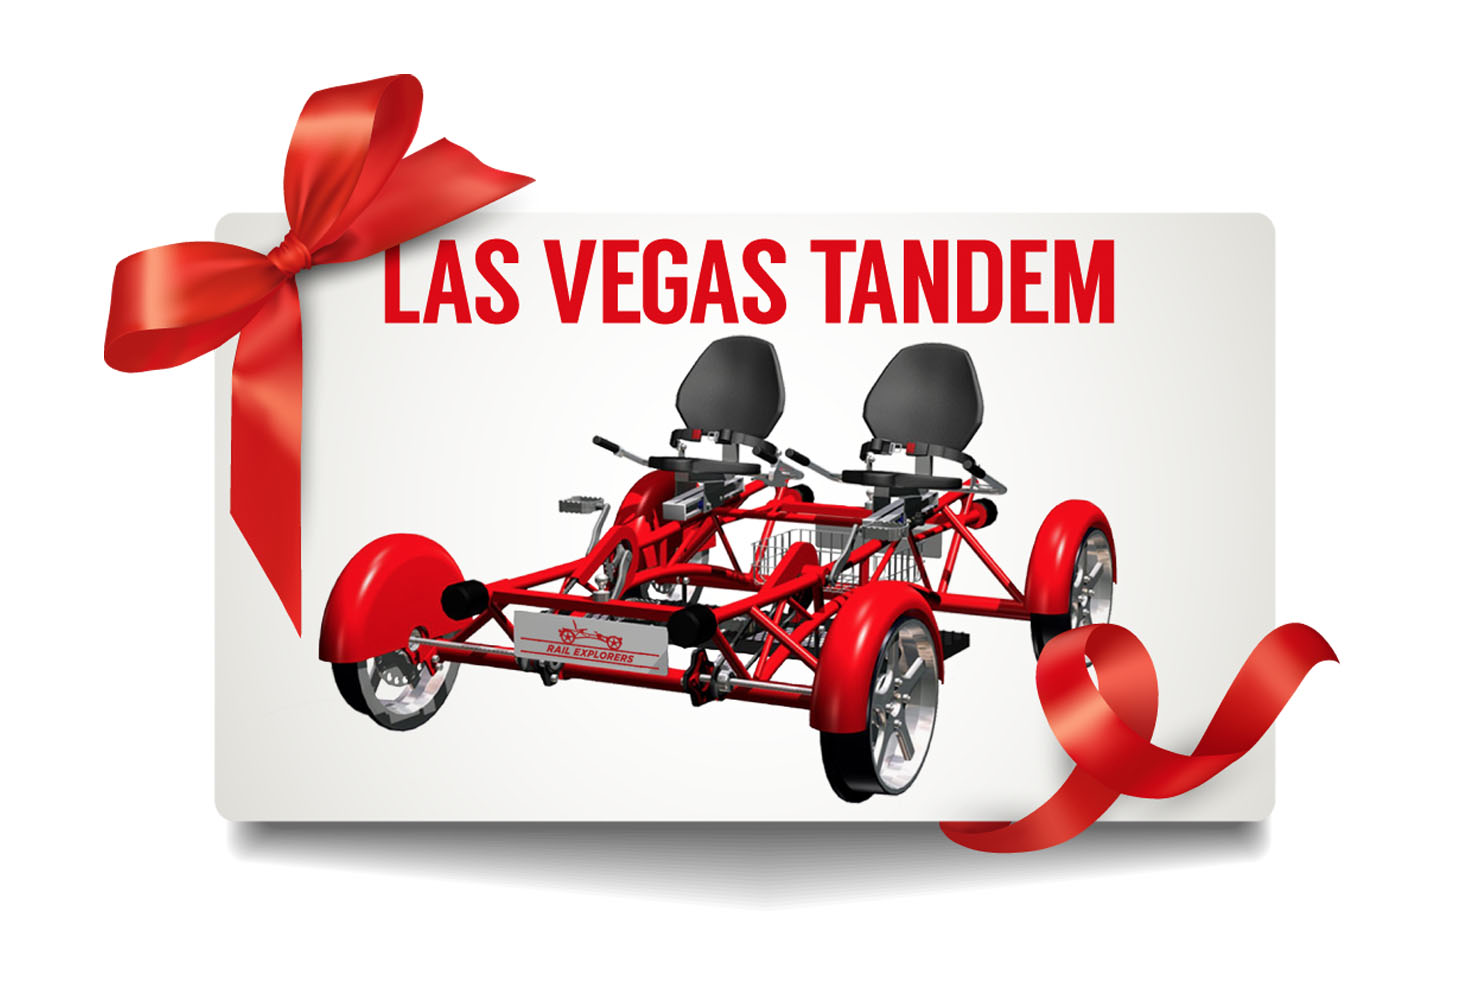 Gift Card: Las Vegas Tandem $85